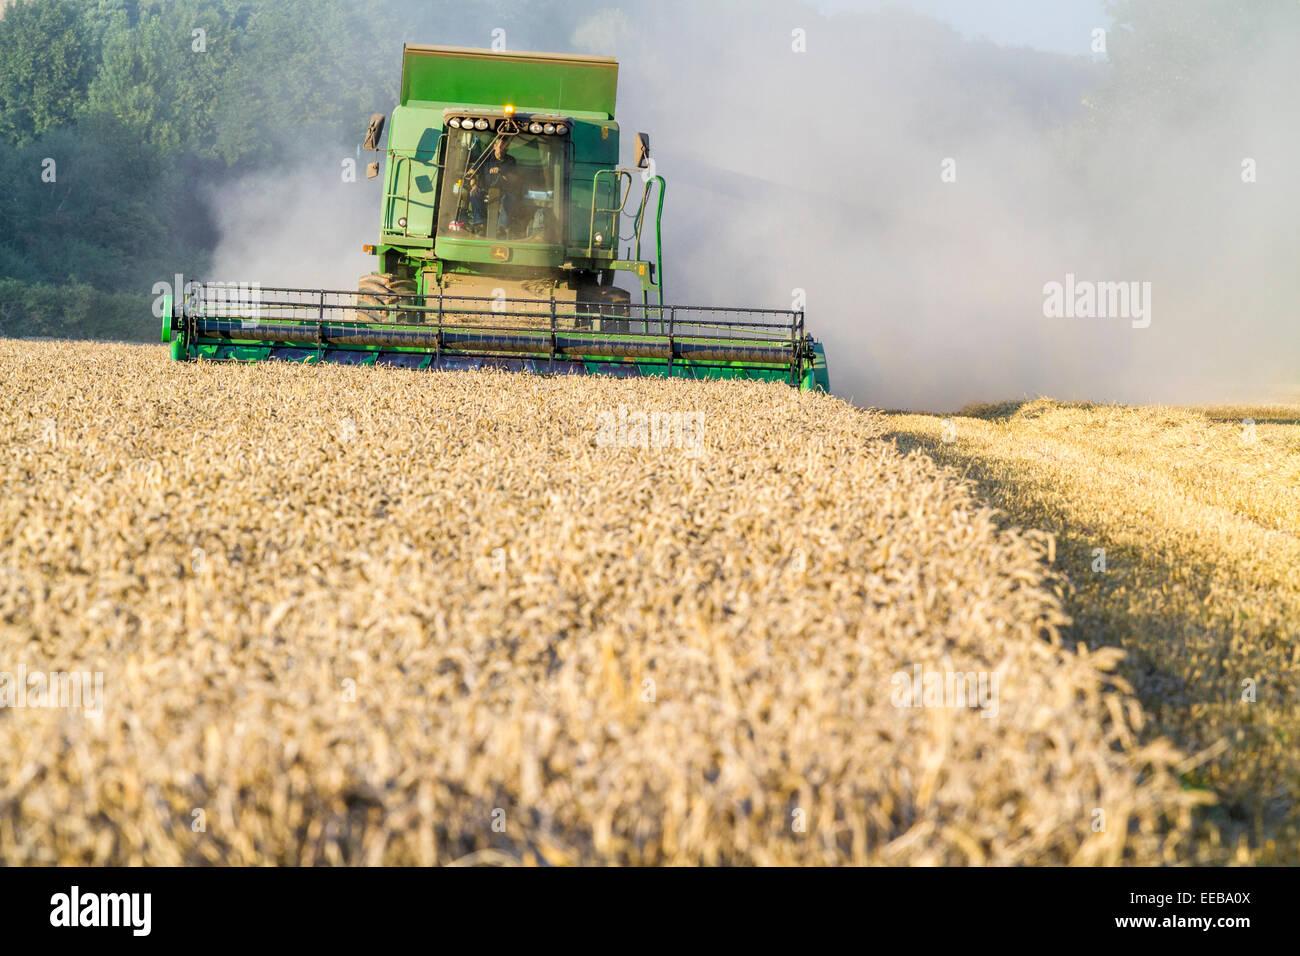 Combine harvester harvesting a wheat field, Burton Joyce, Nottinghamshire, England, UK - Stock Image